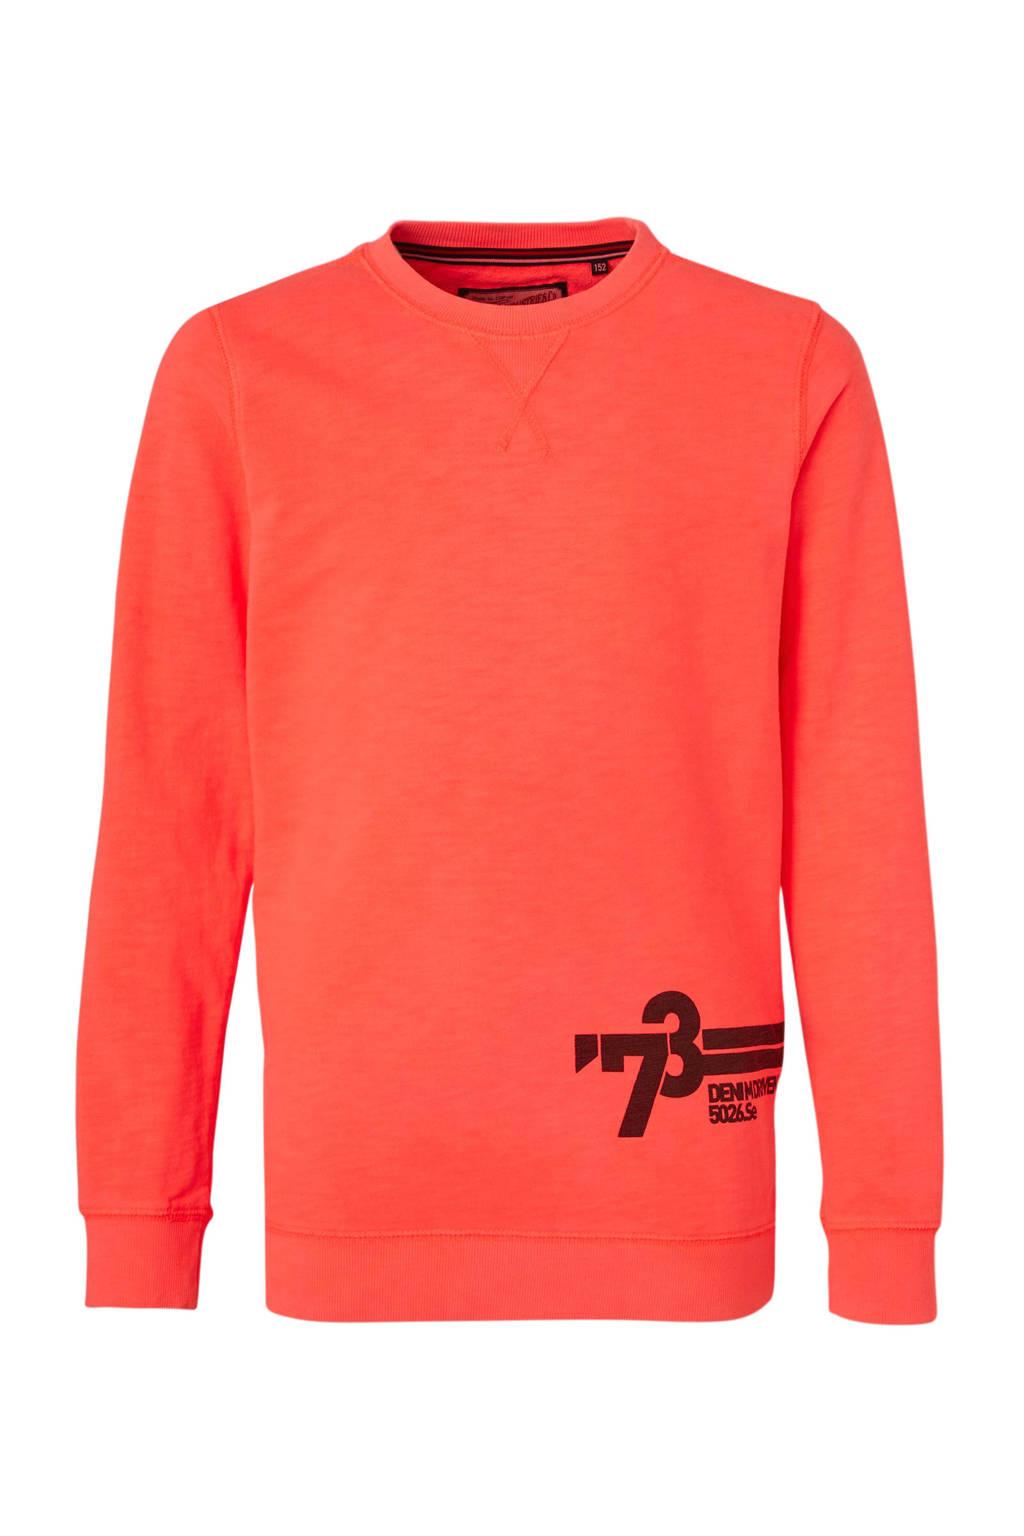 Petrol Industries sweater met printopdruk oranje/zwart, Oranje/zwart